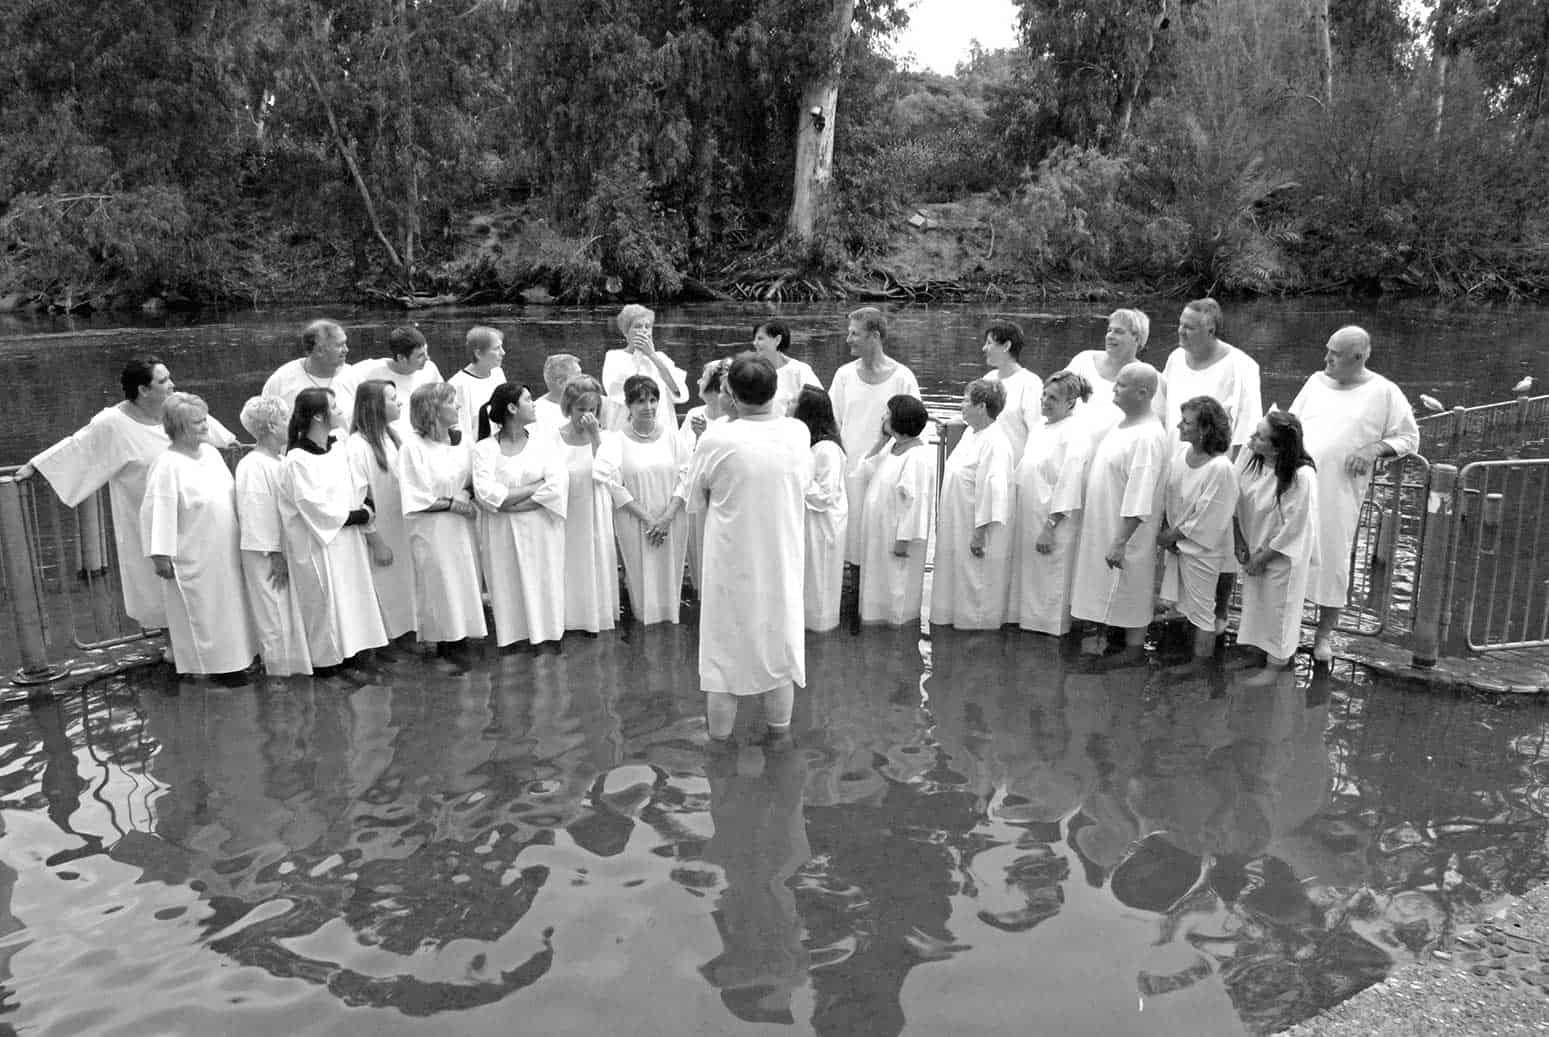 Baptismal Service at the Jordan River image